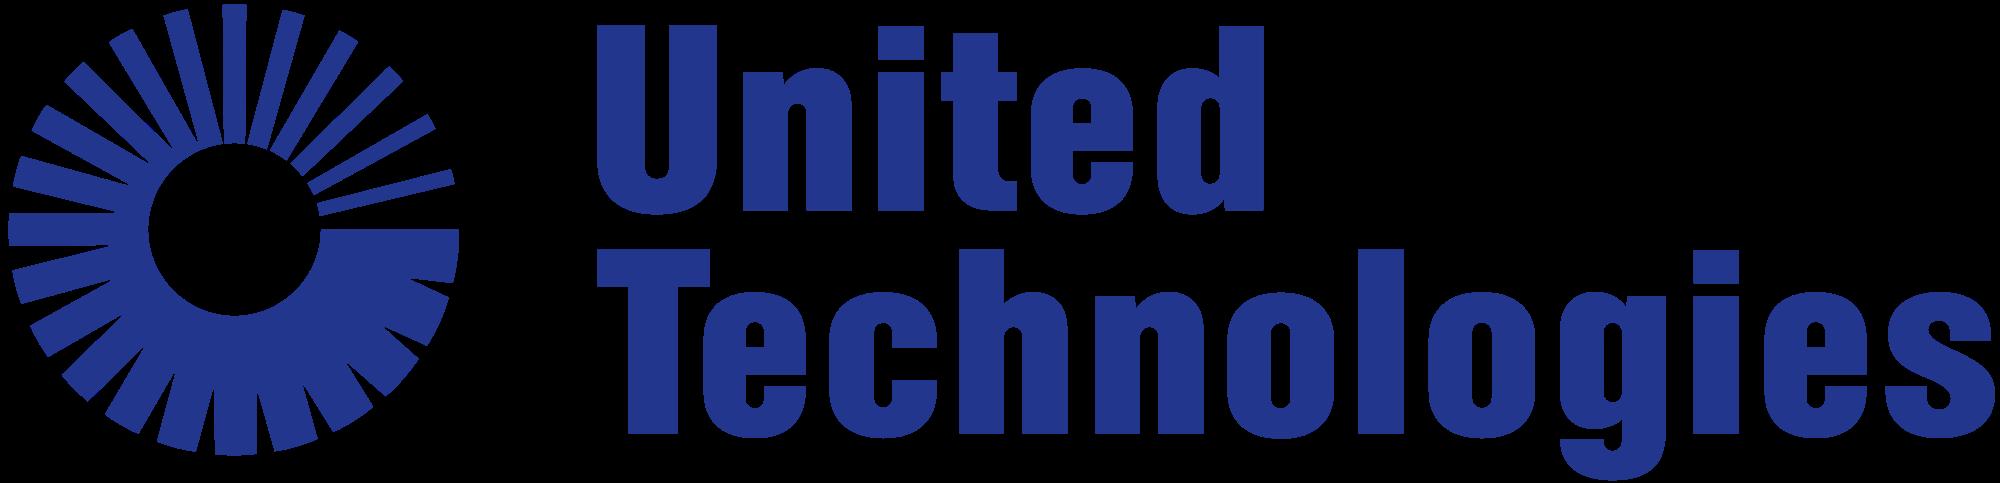 UnitedTechnologiesLogo.png